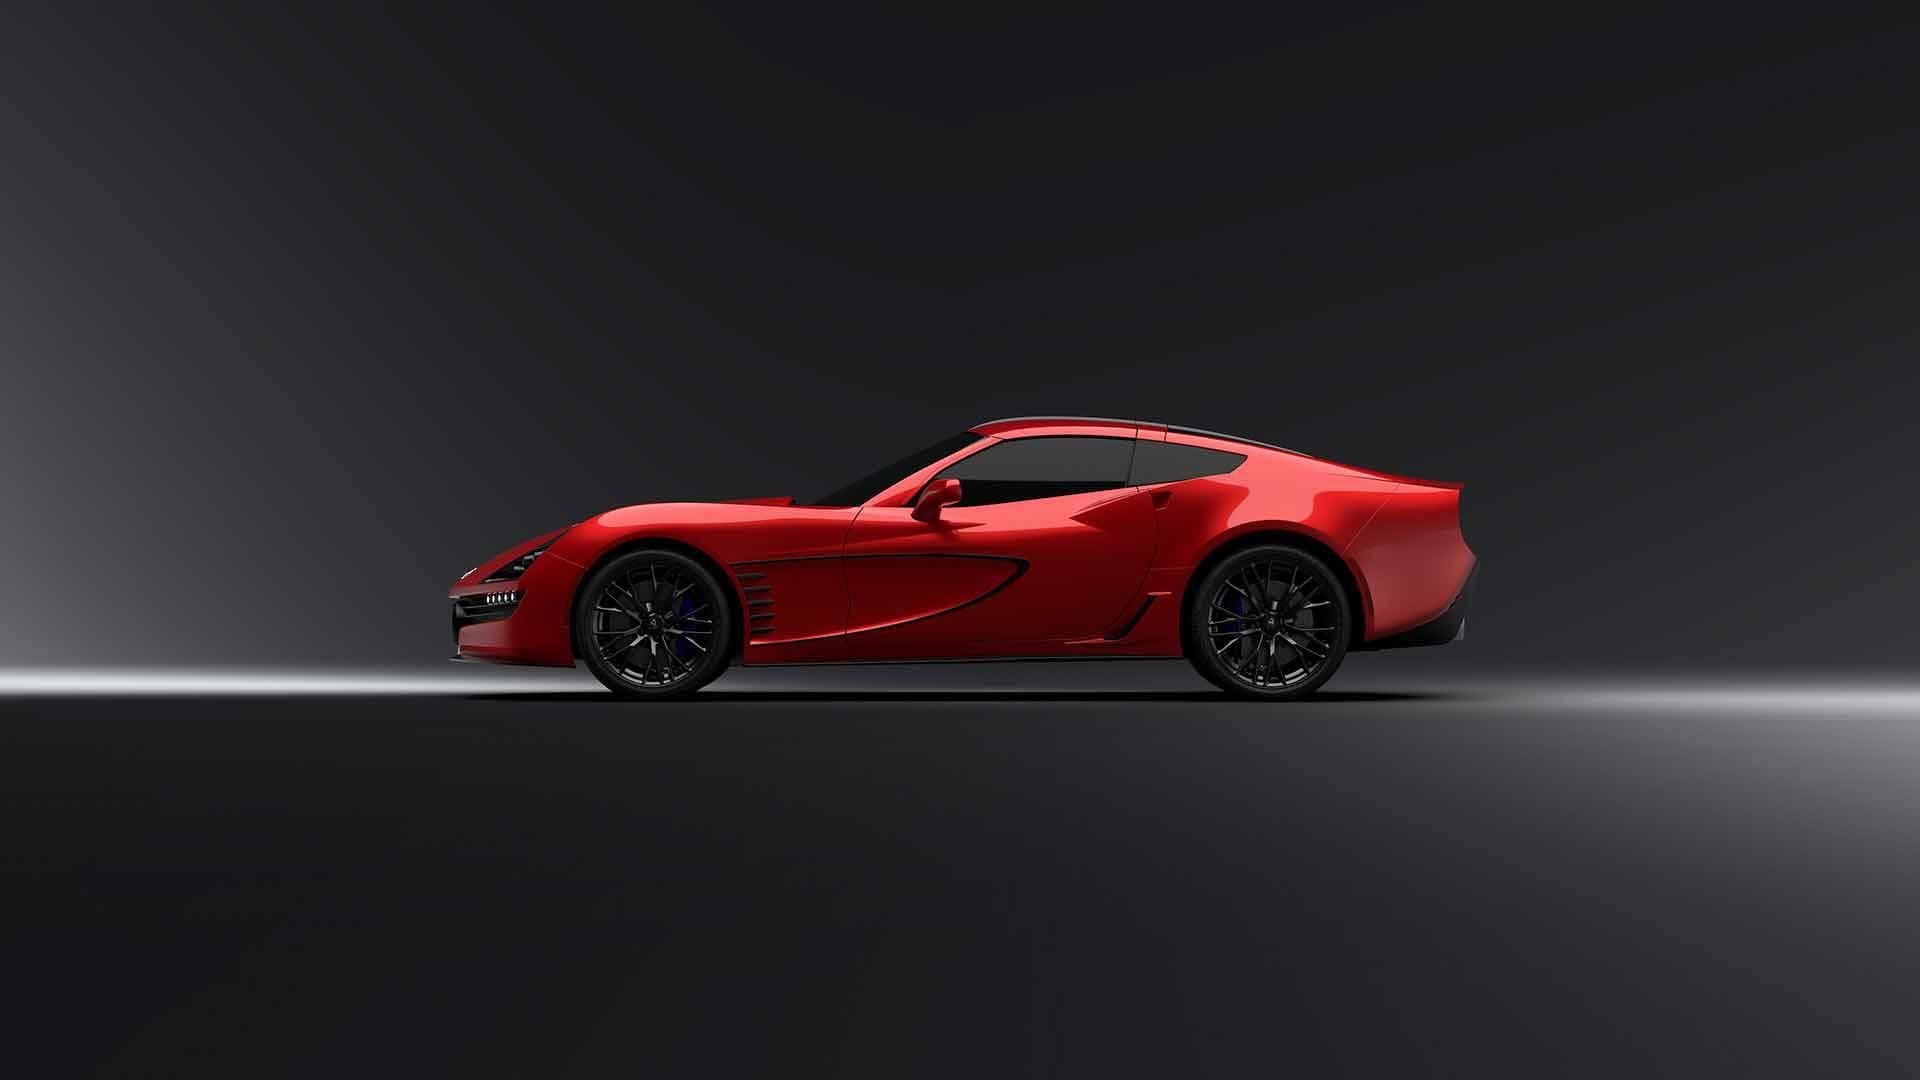 Chevy Corvette 2018 >> C7 Corvette-based Equus Throwback Limited To 25 Units, Starts At $130,000 - autoevolution